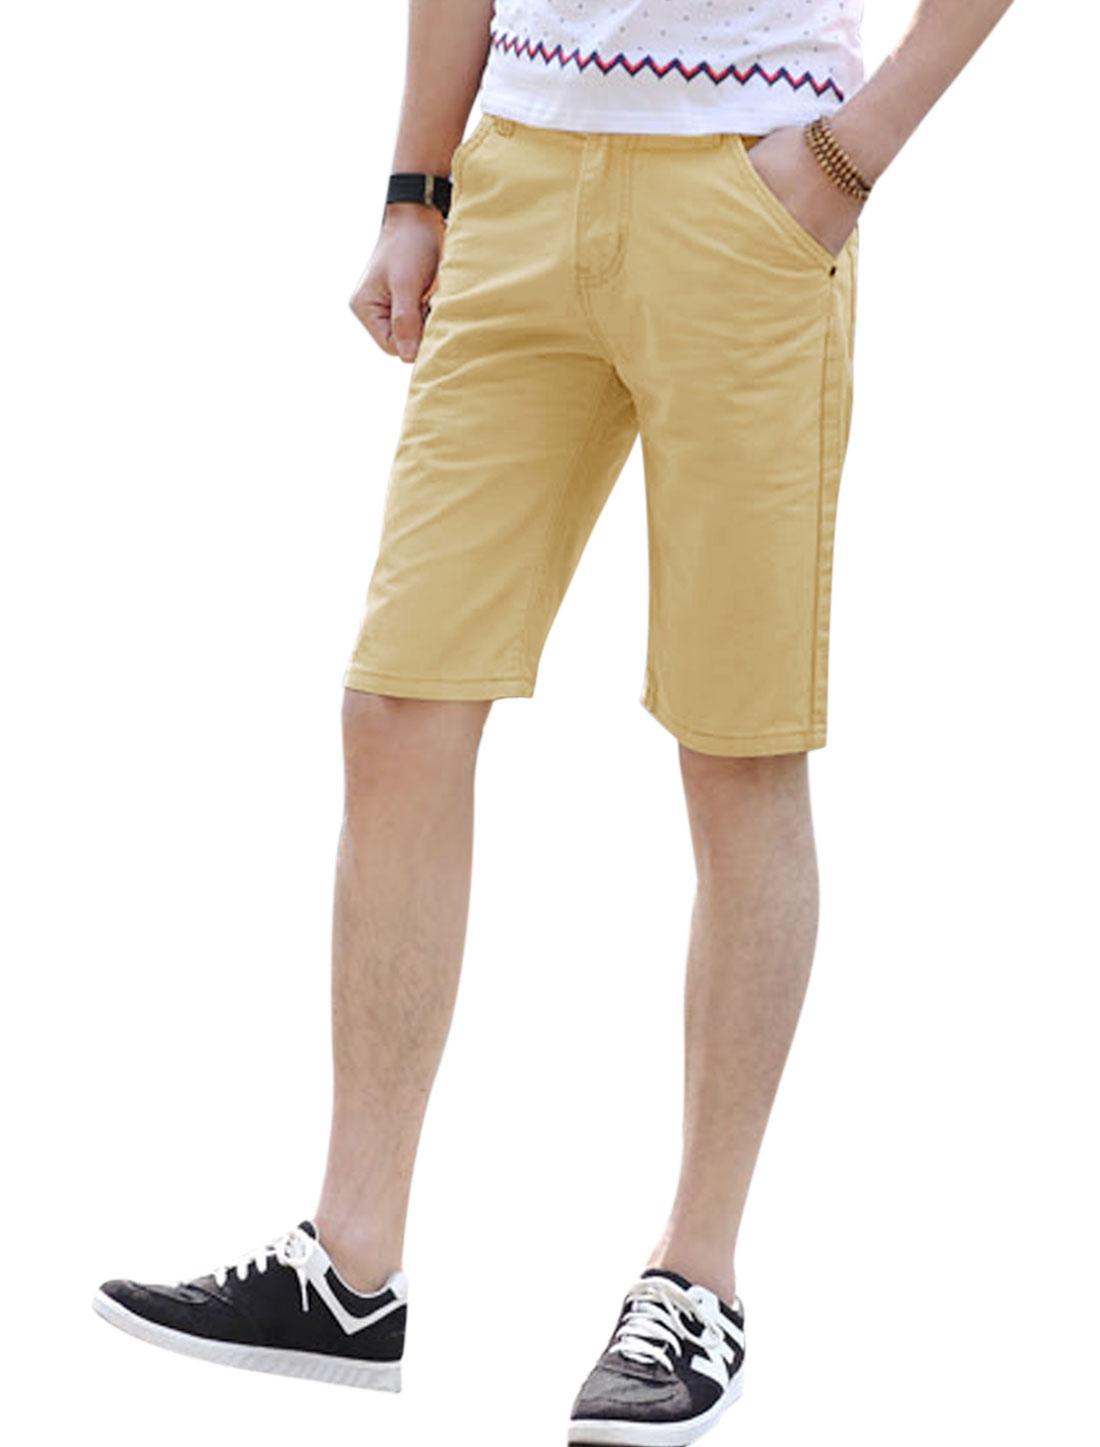 Men Mid Rise Zip Fly Button Closure Summer Short Pants Khaki W34